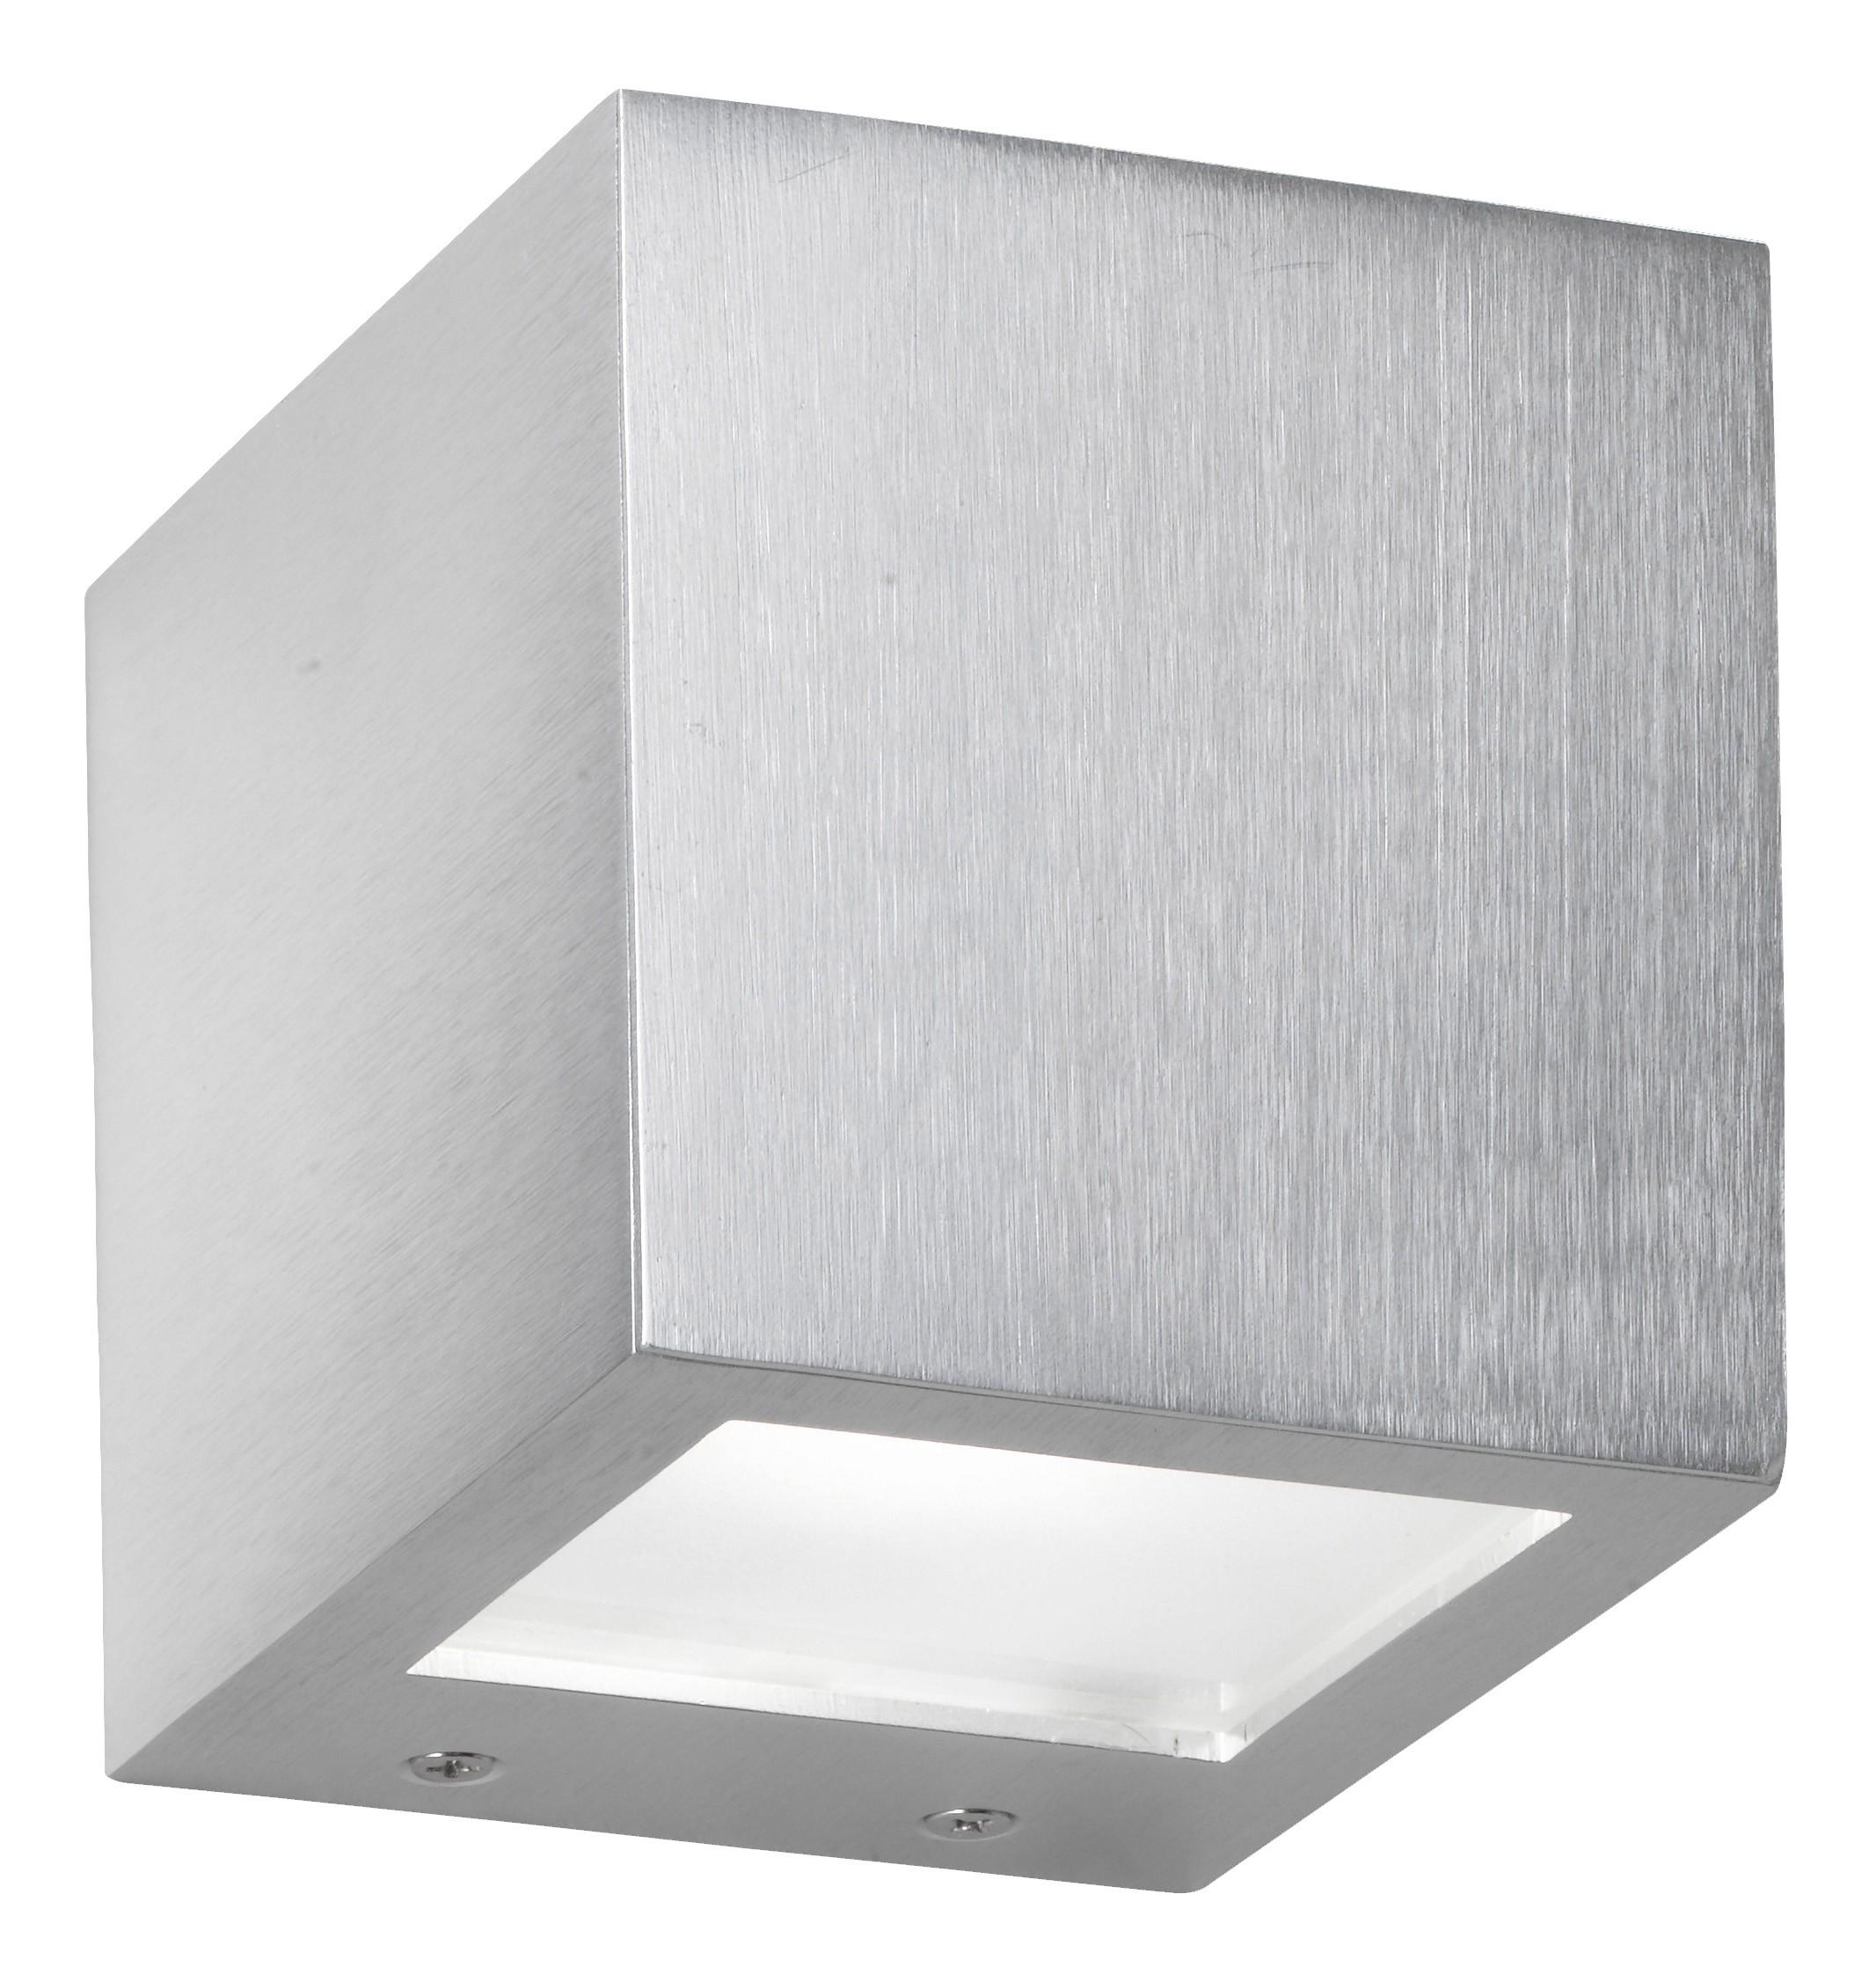 EEK B, Wandleuchte Cub - Aluminium - Silber - 1-flammig, Paul Neuhaus